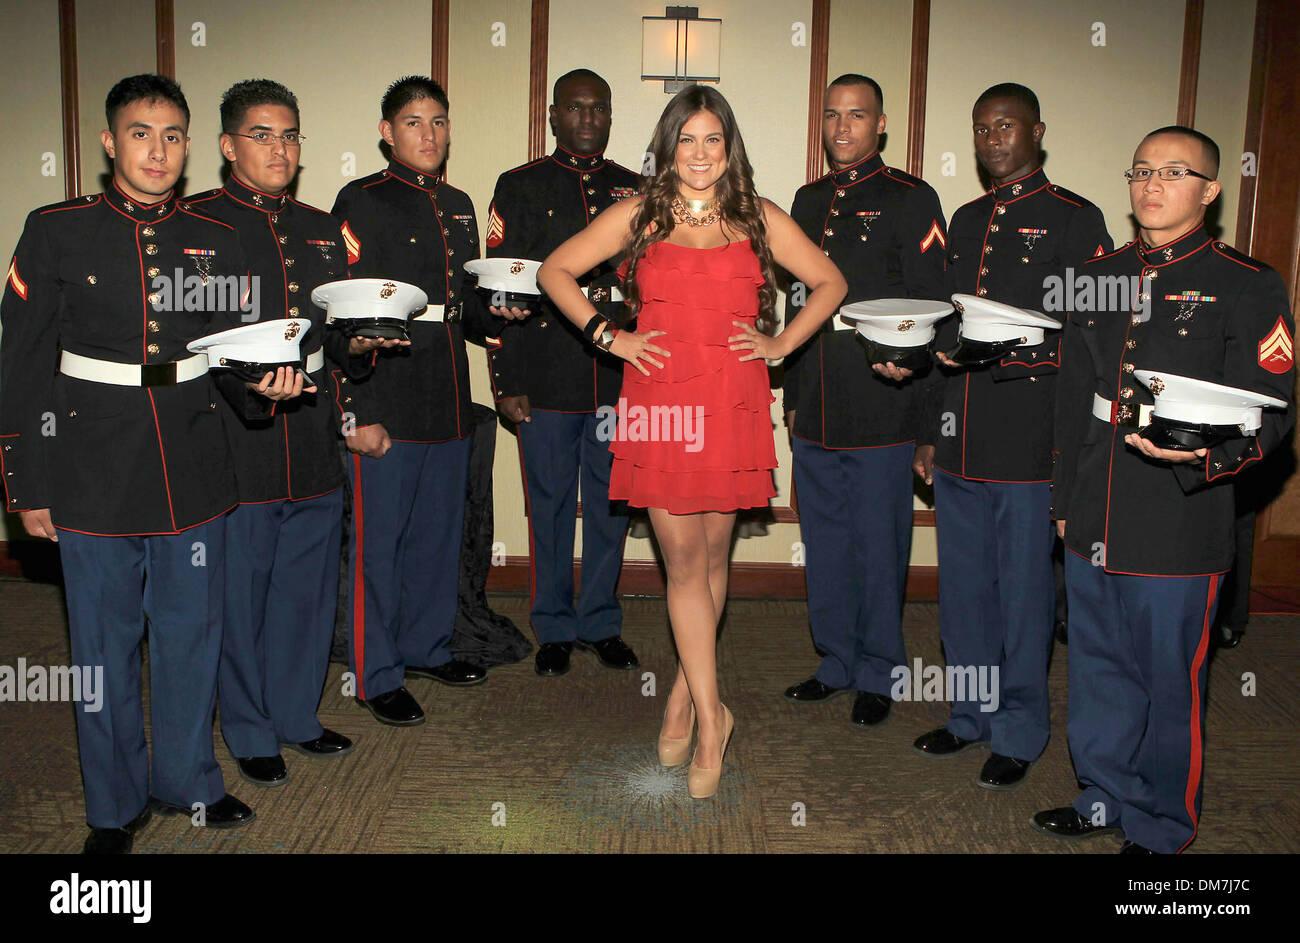 Raquel Castaneda with US Marine Corp Stonewall Young Democrats 6Th Annual Hero Awards held at Westin Bonaventure Stock Photo